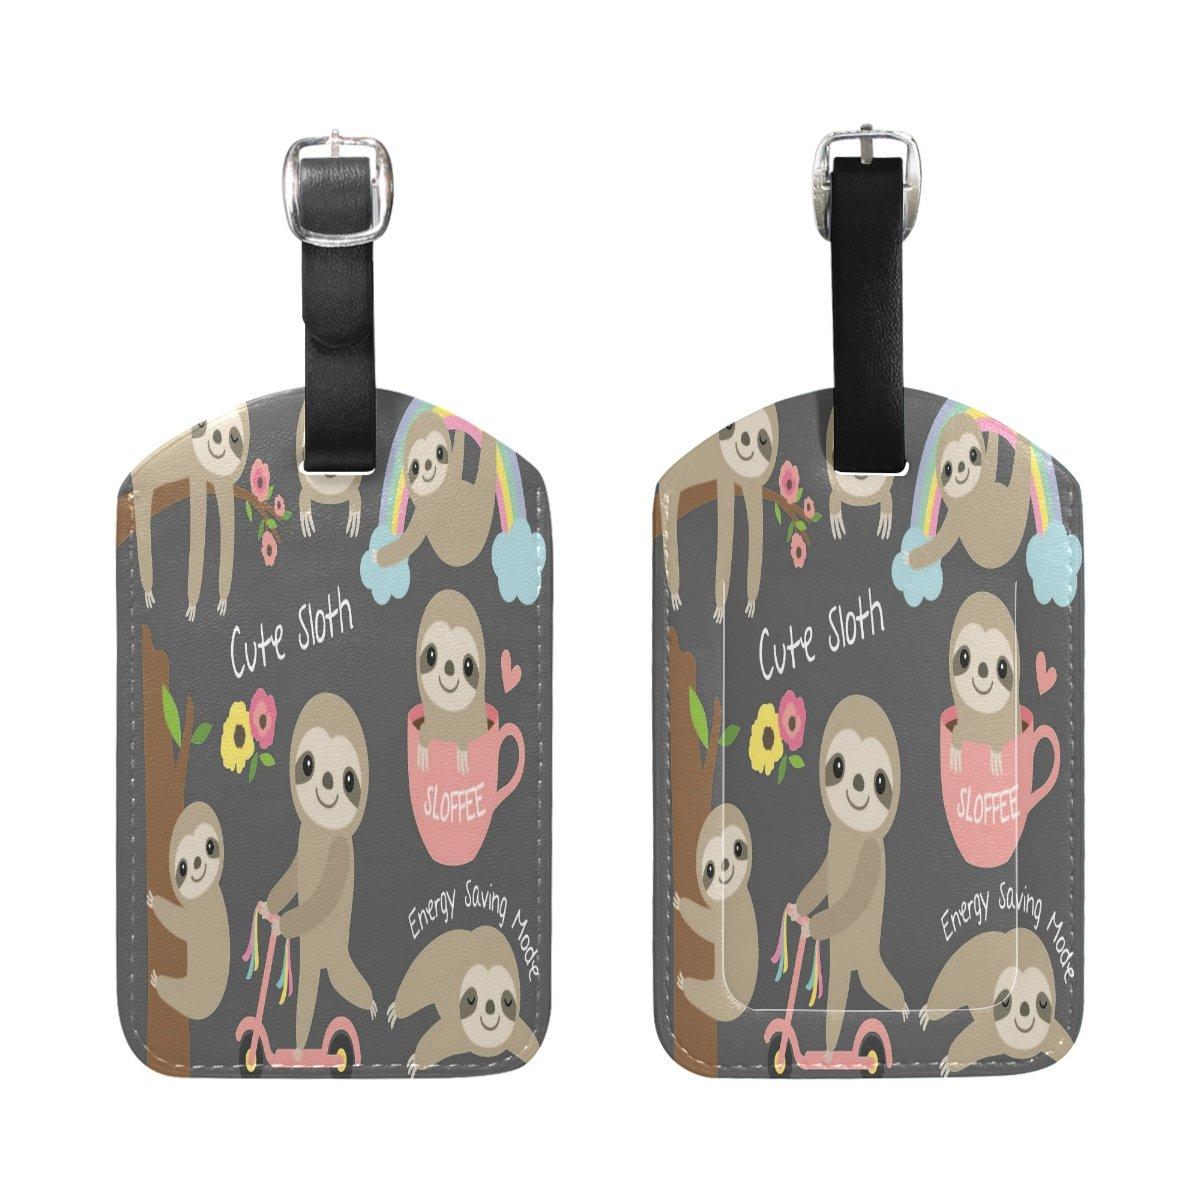 Saobao Travel Luggage Tag Cute Baby Sloth PU Leather Baggage Travel ID